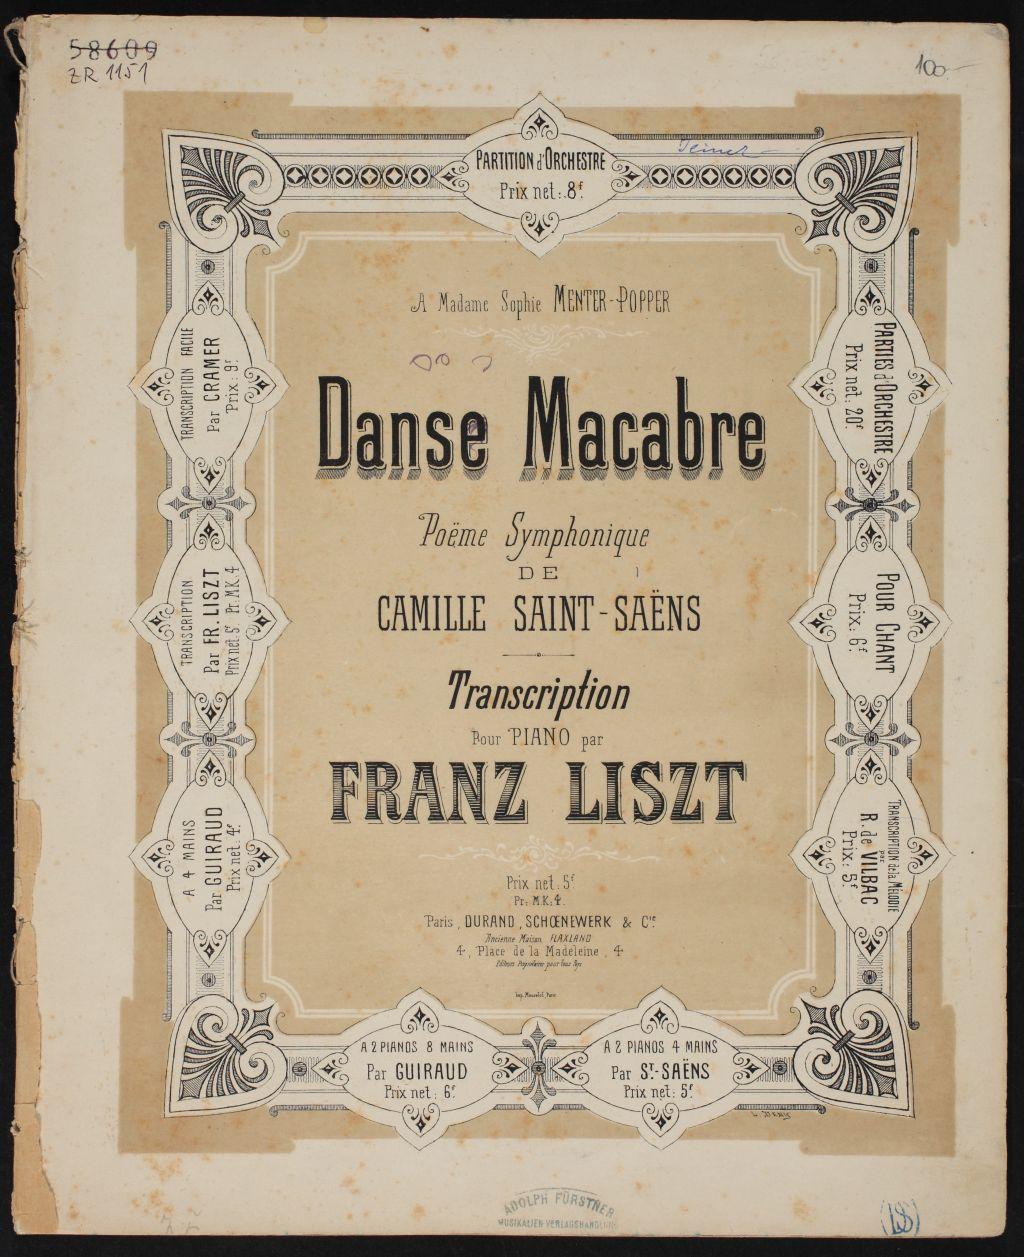 saintsaens_liszt_danse_macabre_piano.jpg